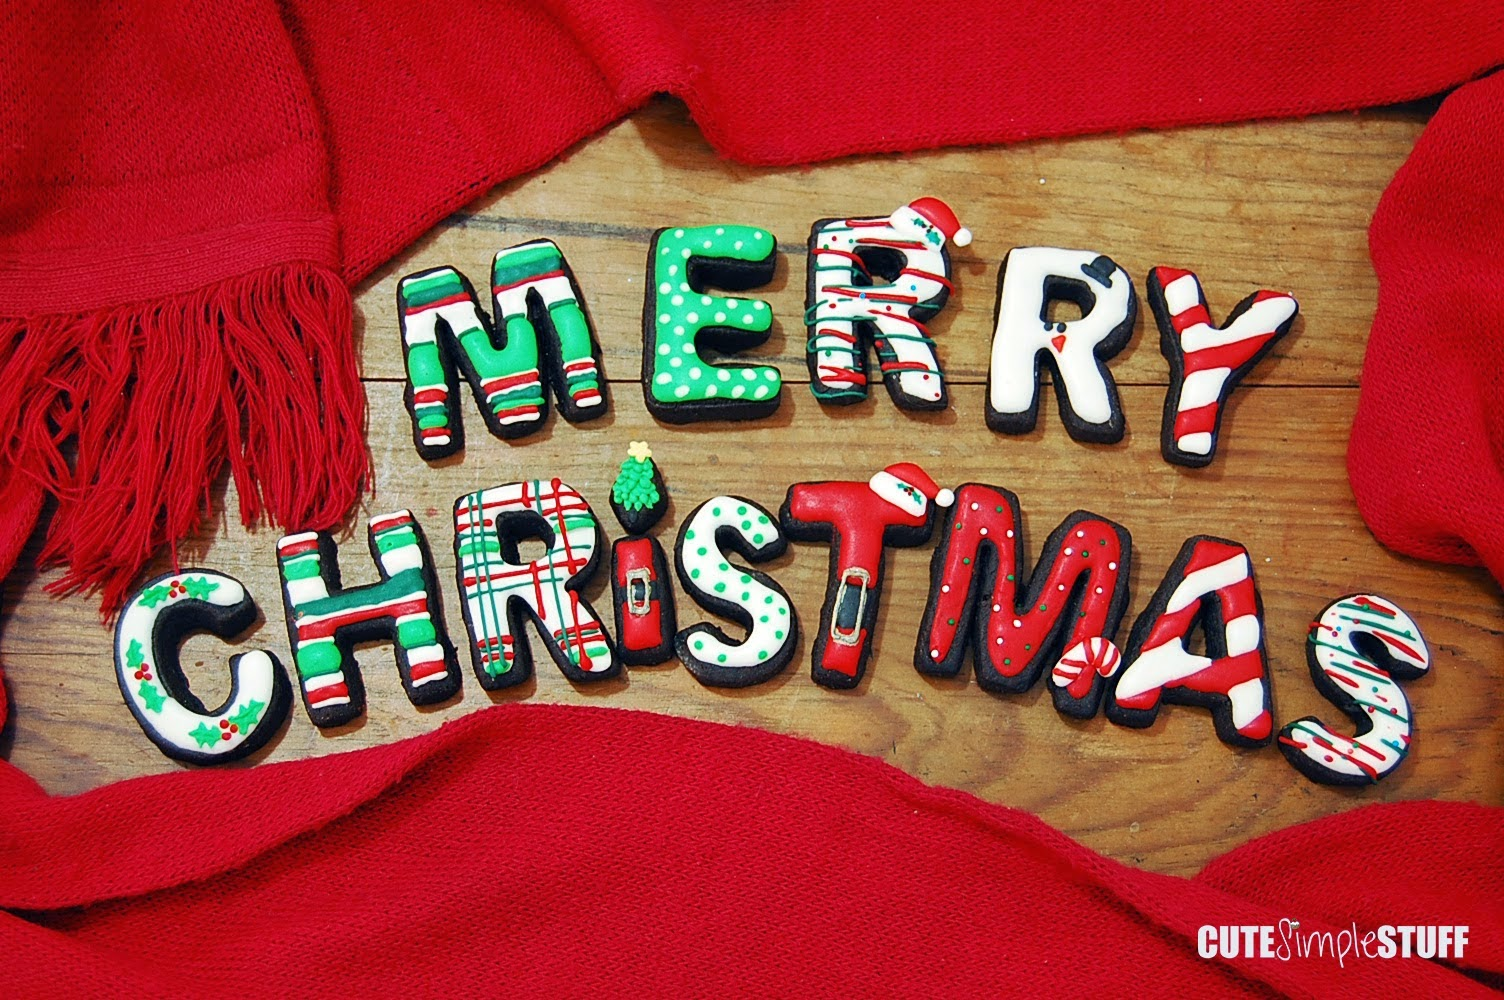 http://www.cutesimplestuff.com/2014/12/merry-christmas-cookies.html